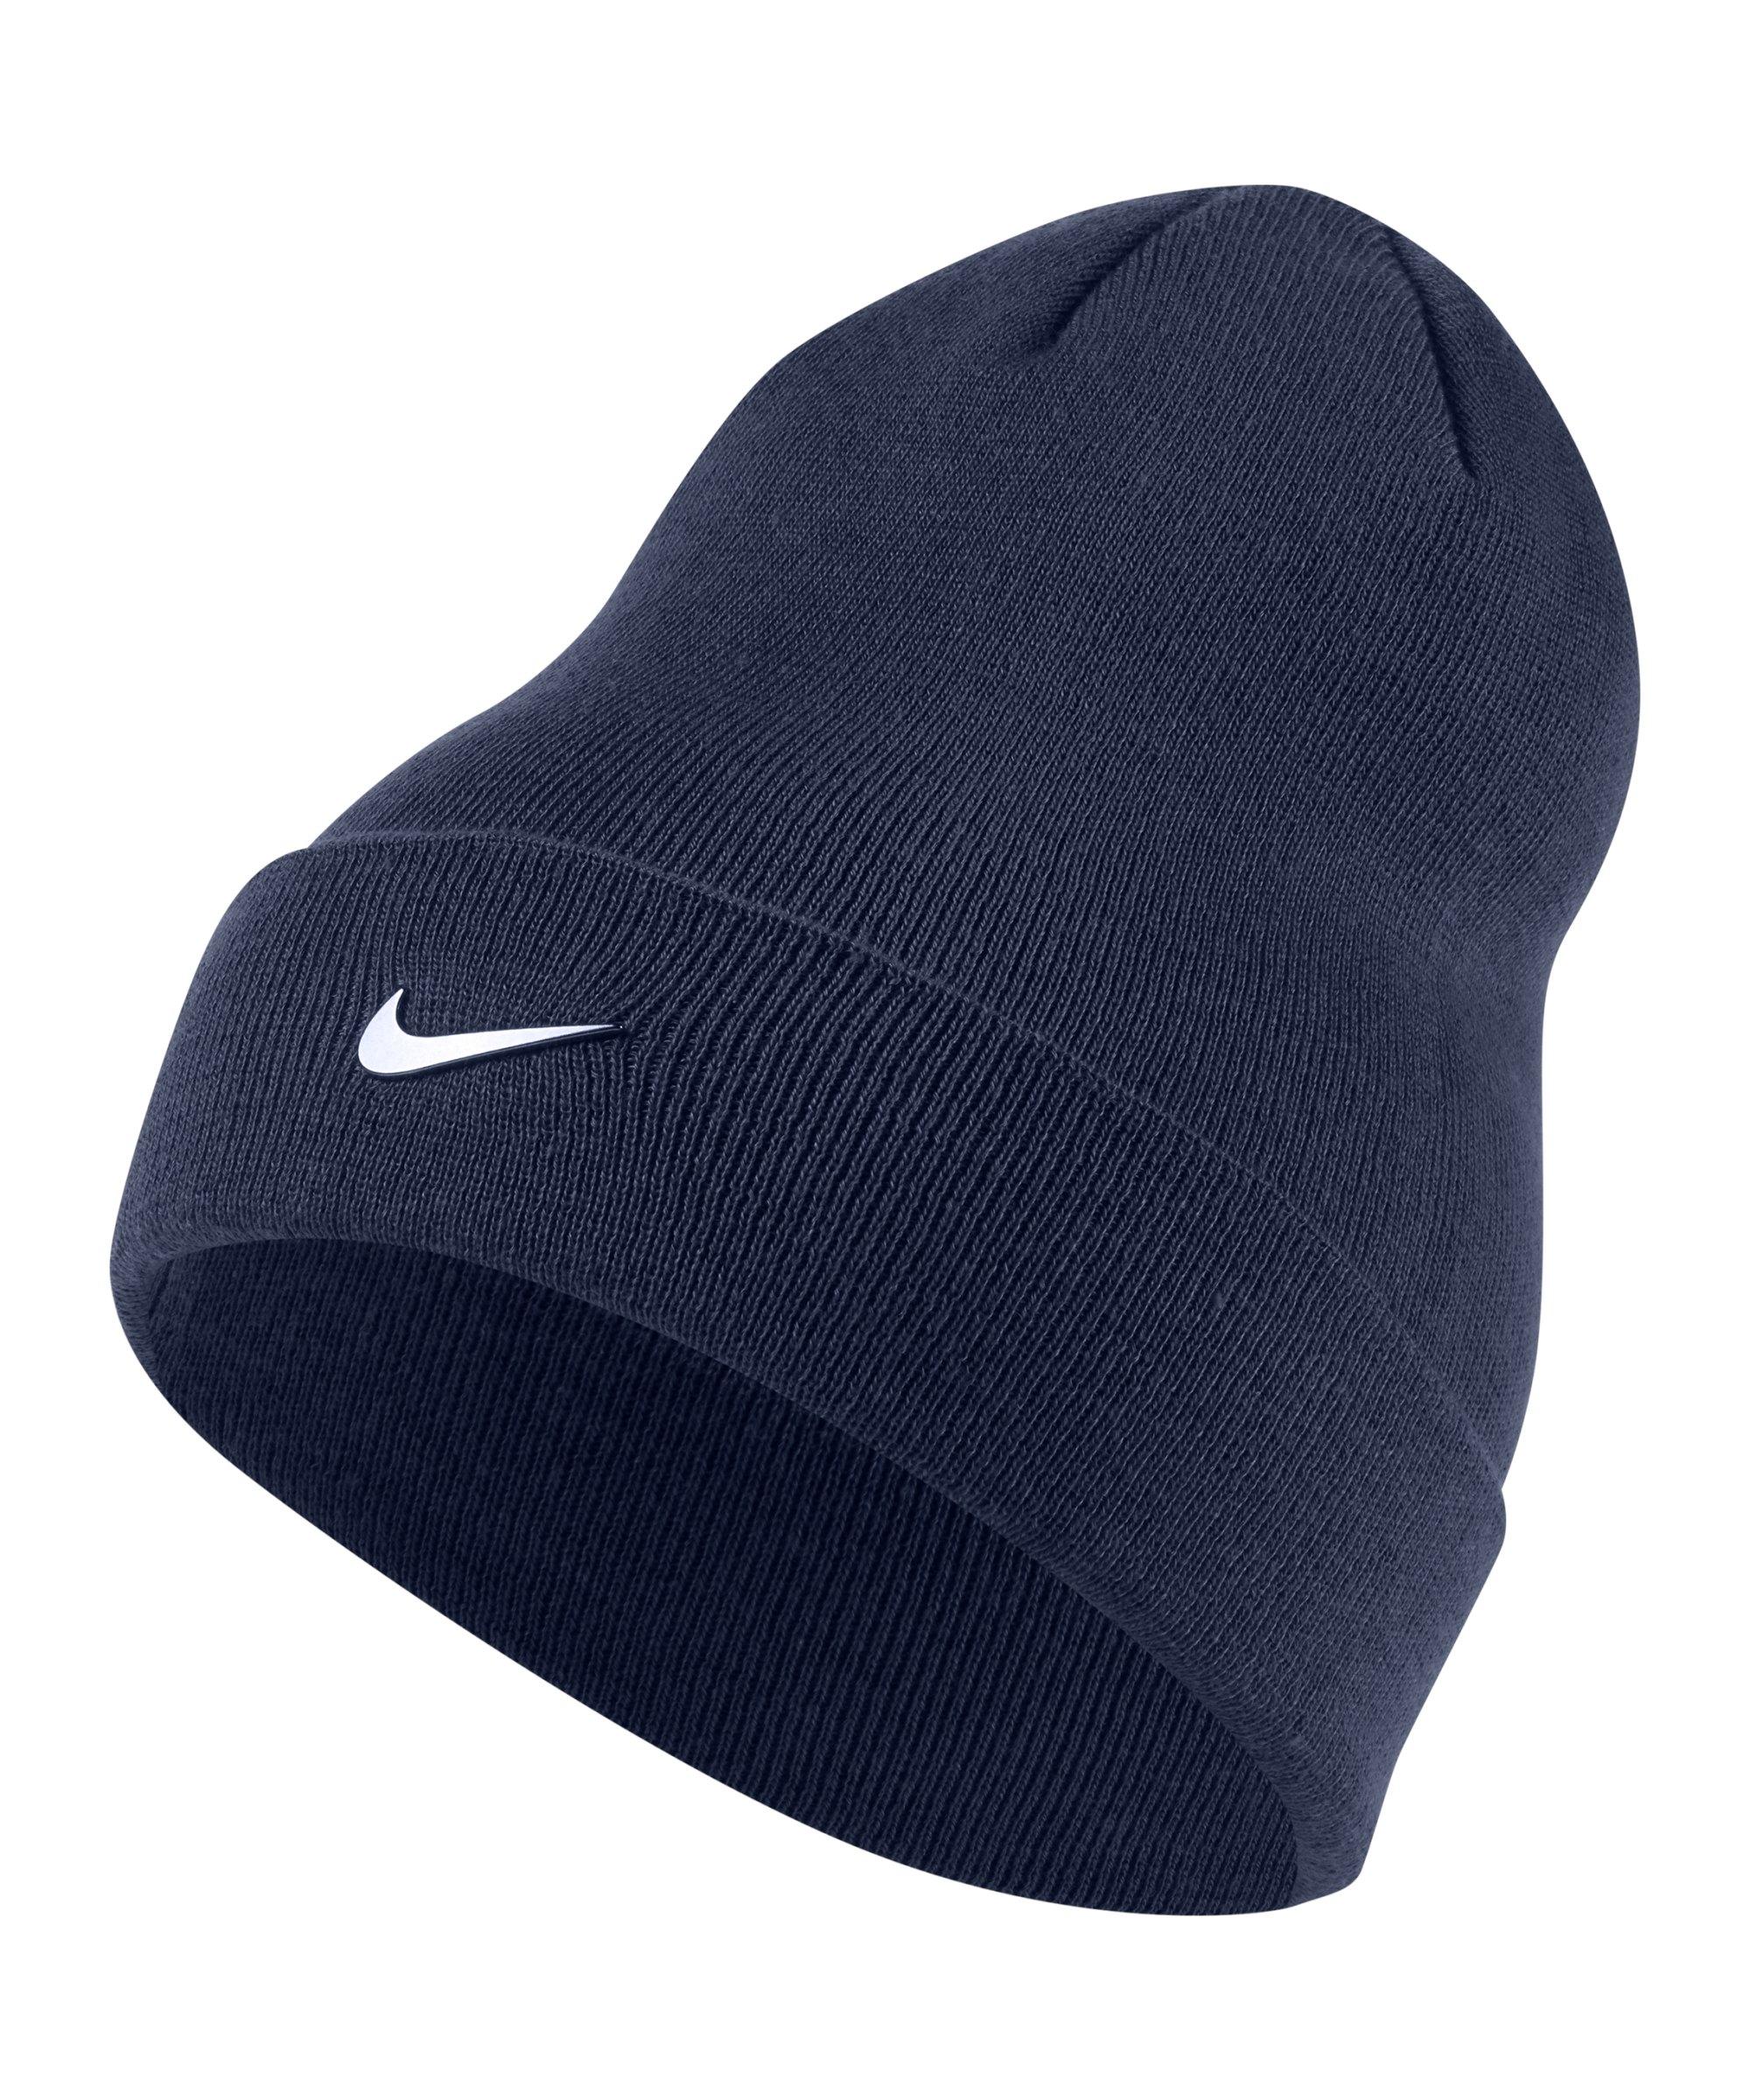 Nike Mütze Kids Blau F410 - blau